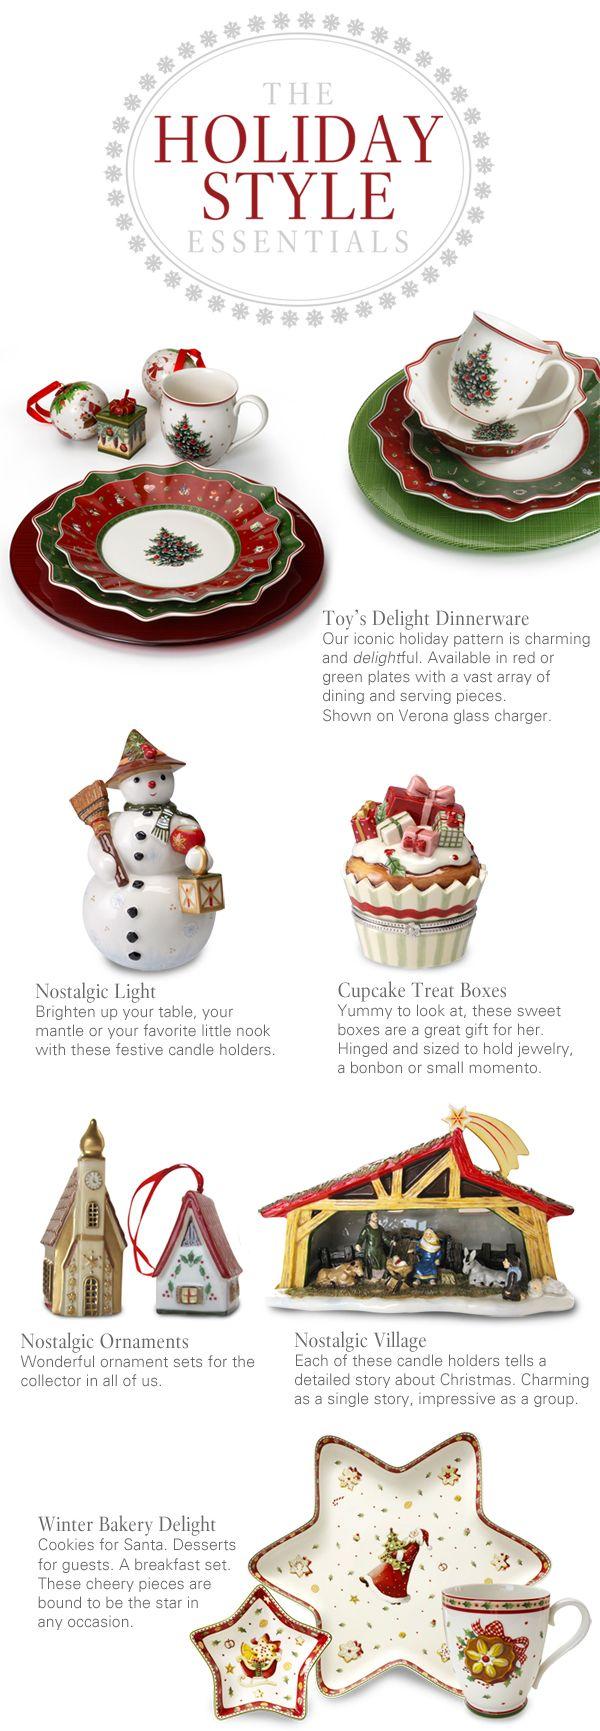 Villeroy & Boch Christmas Dinnerware